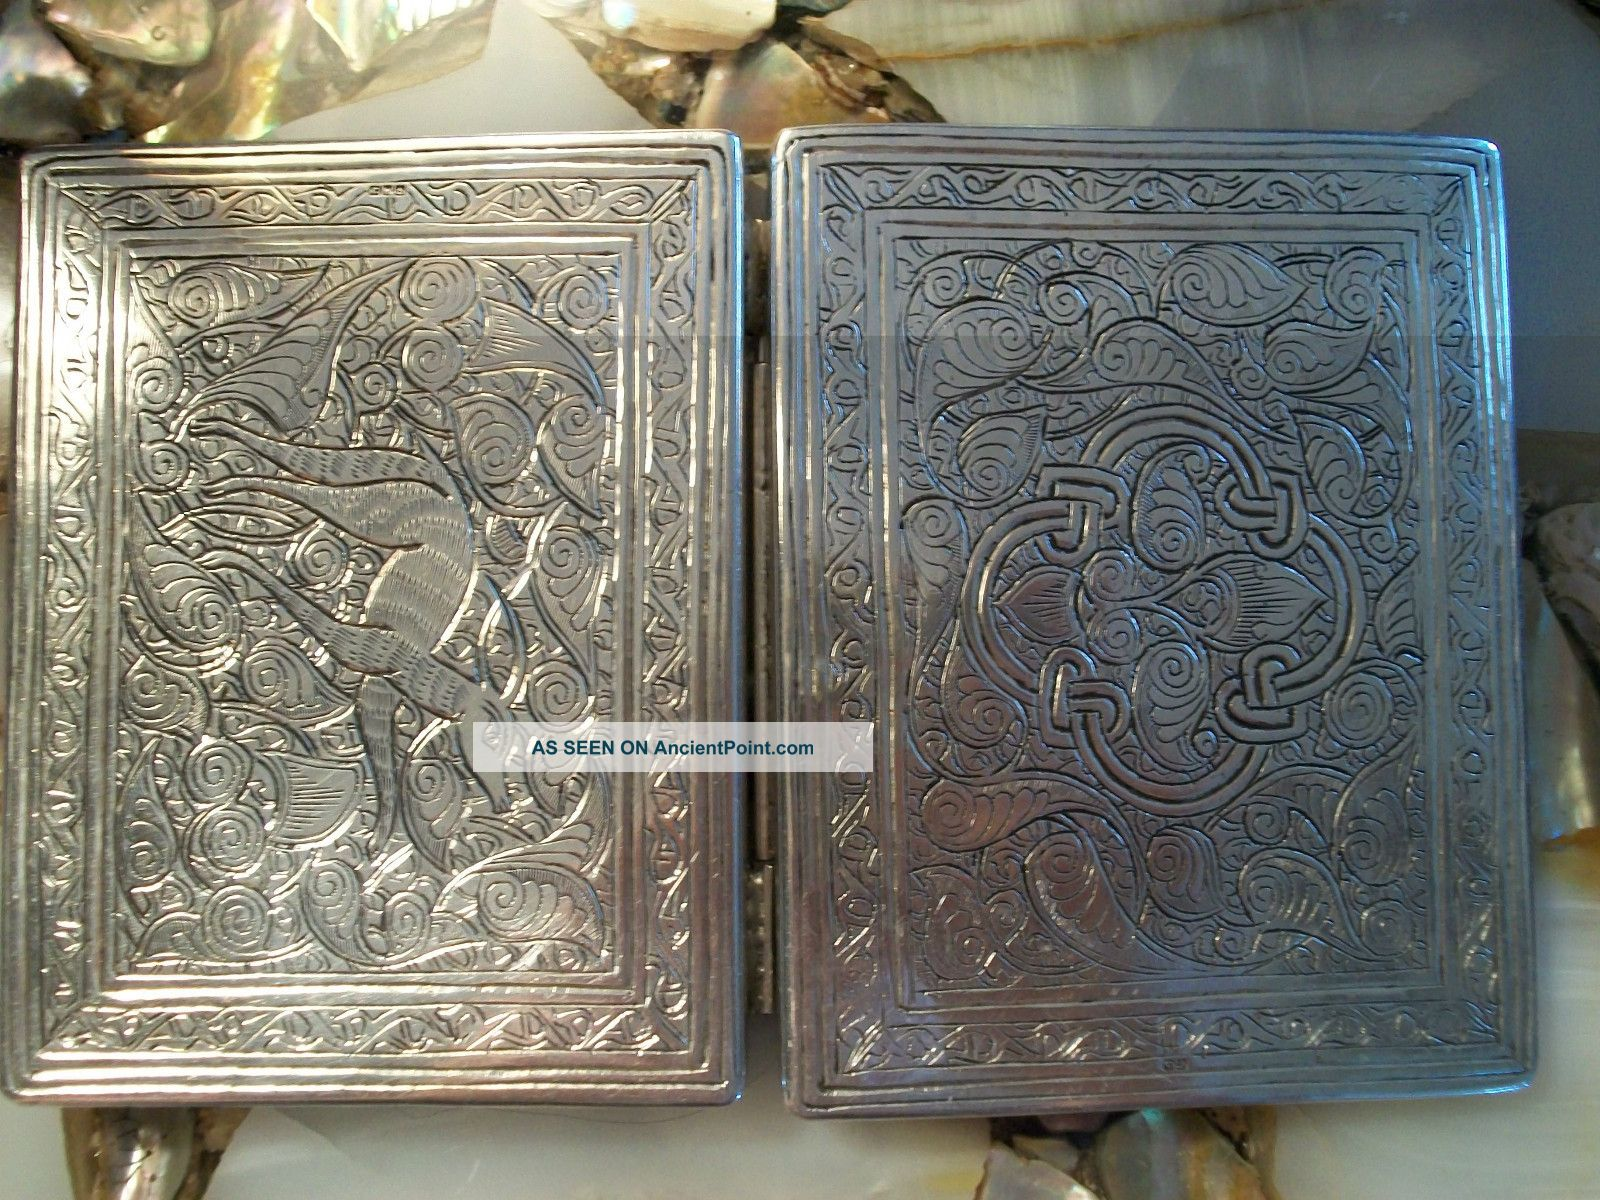 Antique Silver Otto Persian ? Egypt Islamic Hallmark Cigarette Card Case 107.  67g Middle East photo